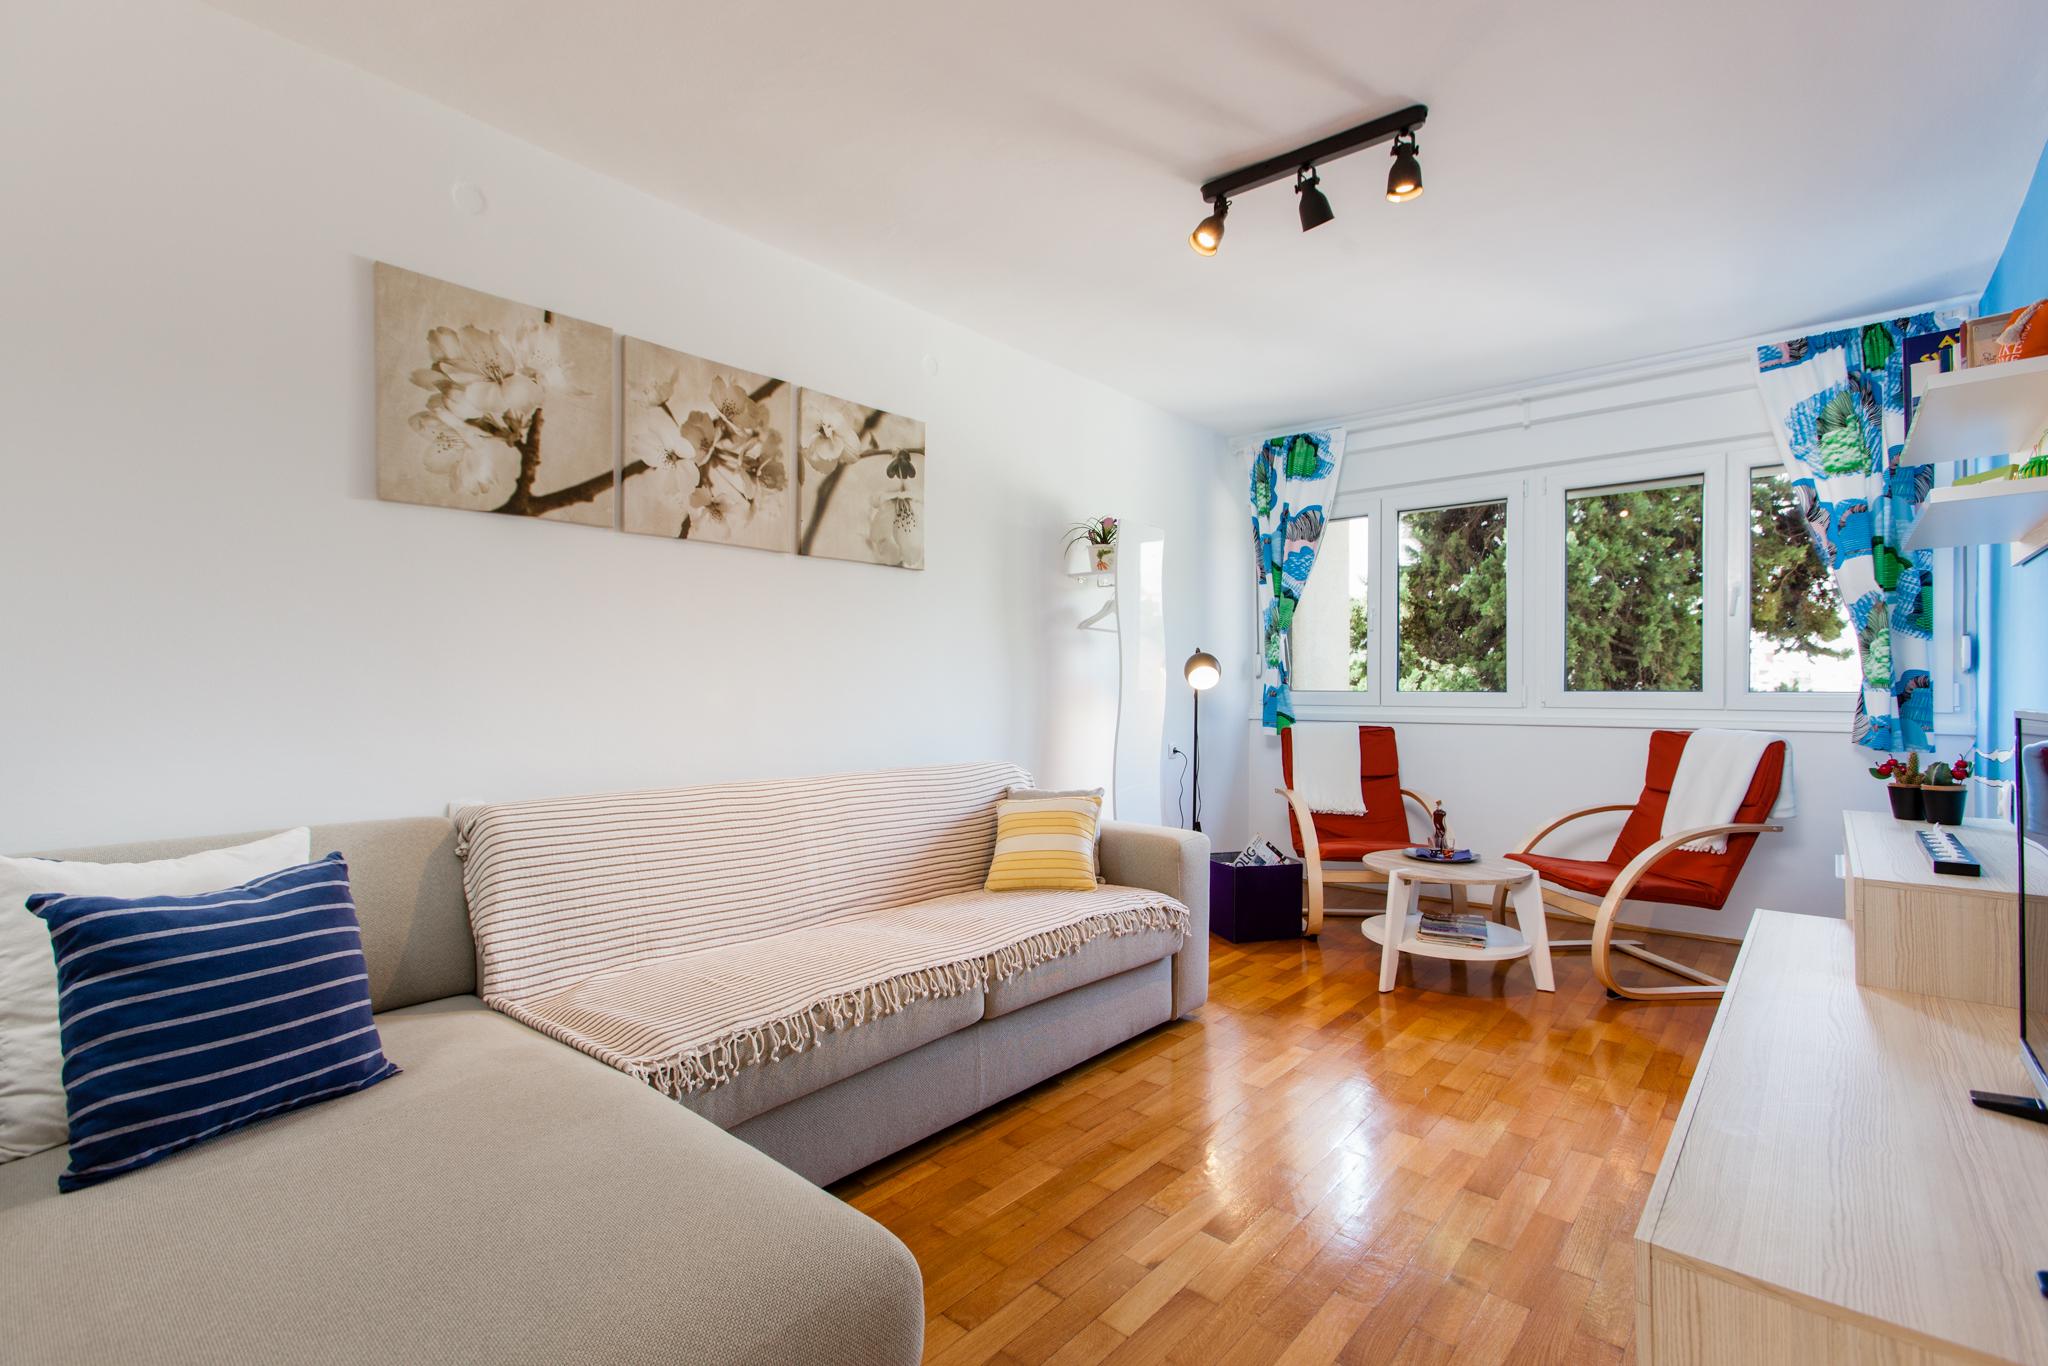 Apartment Split - Corto Maltese (8)